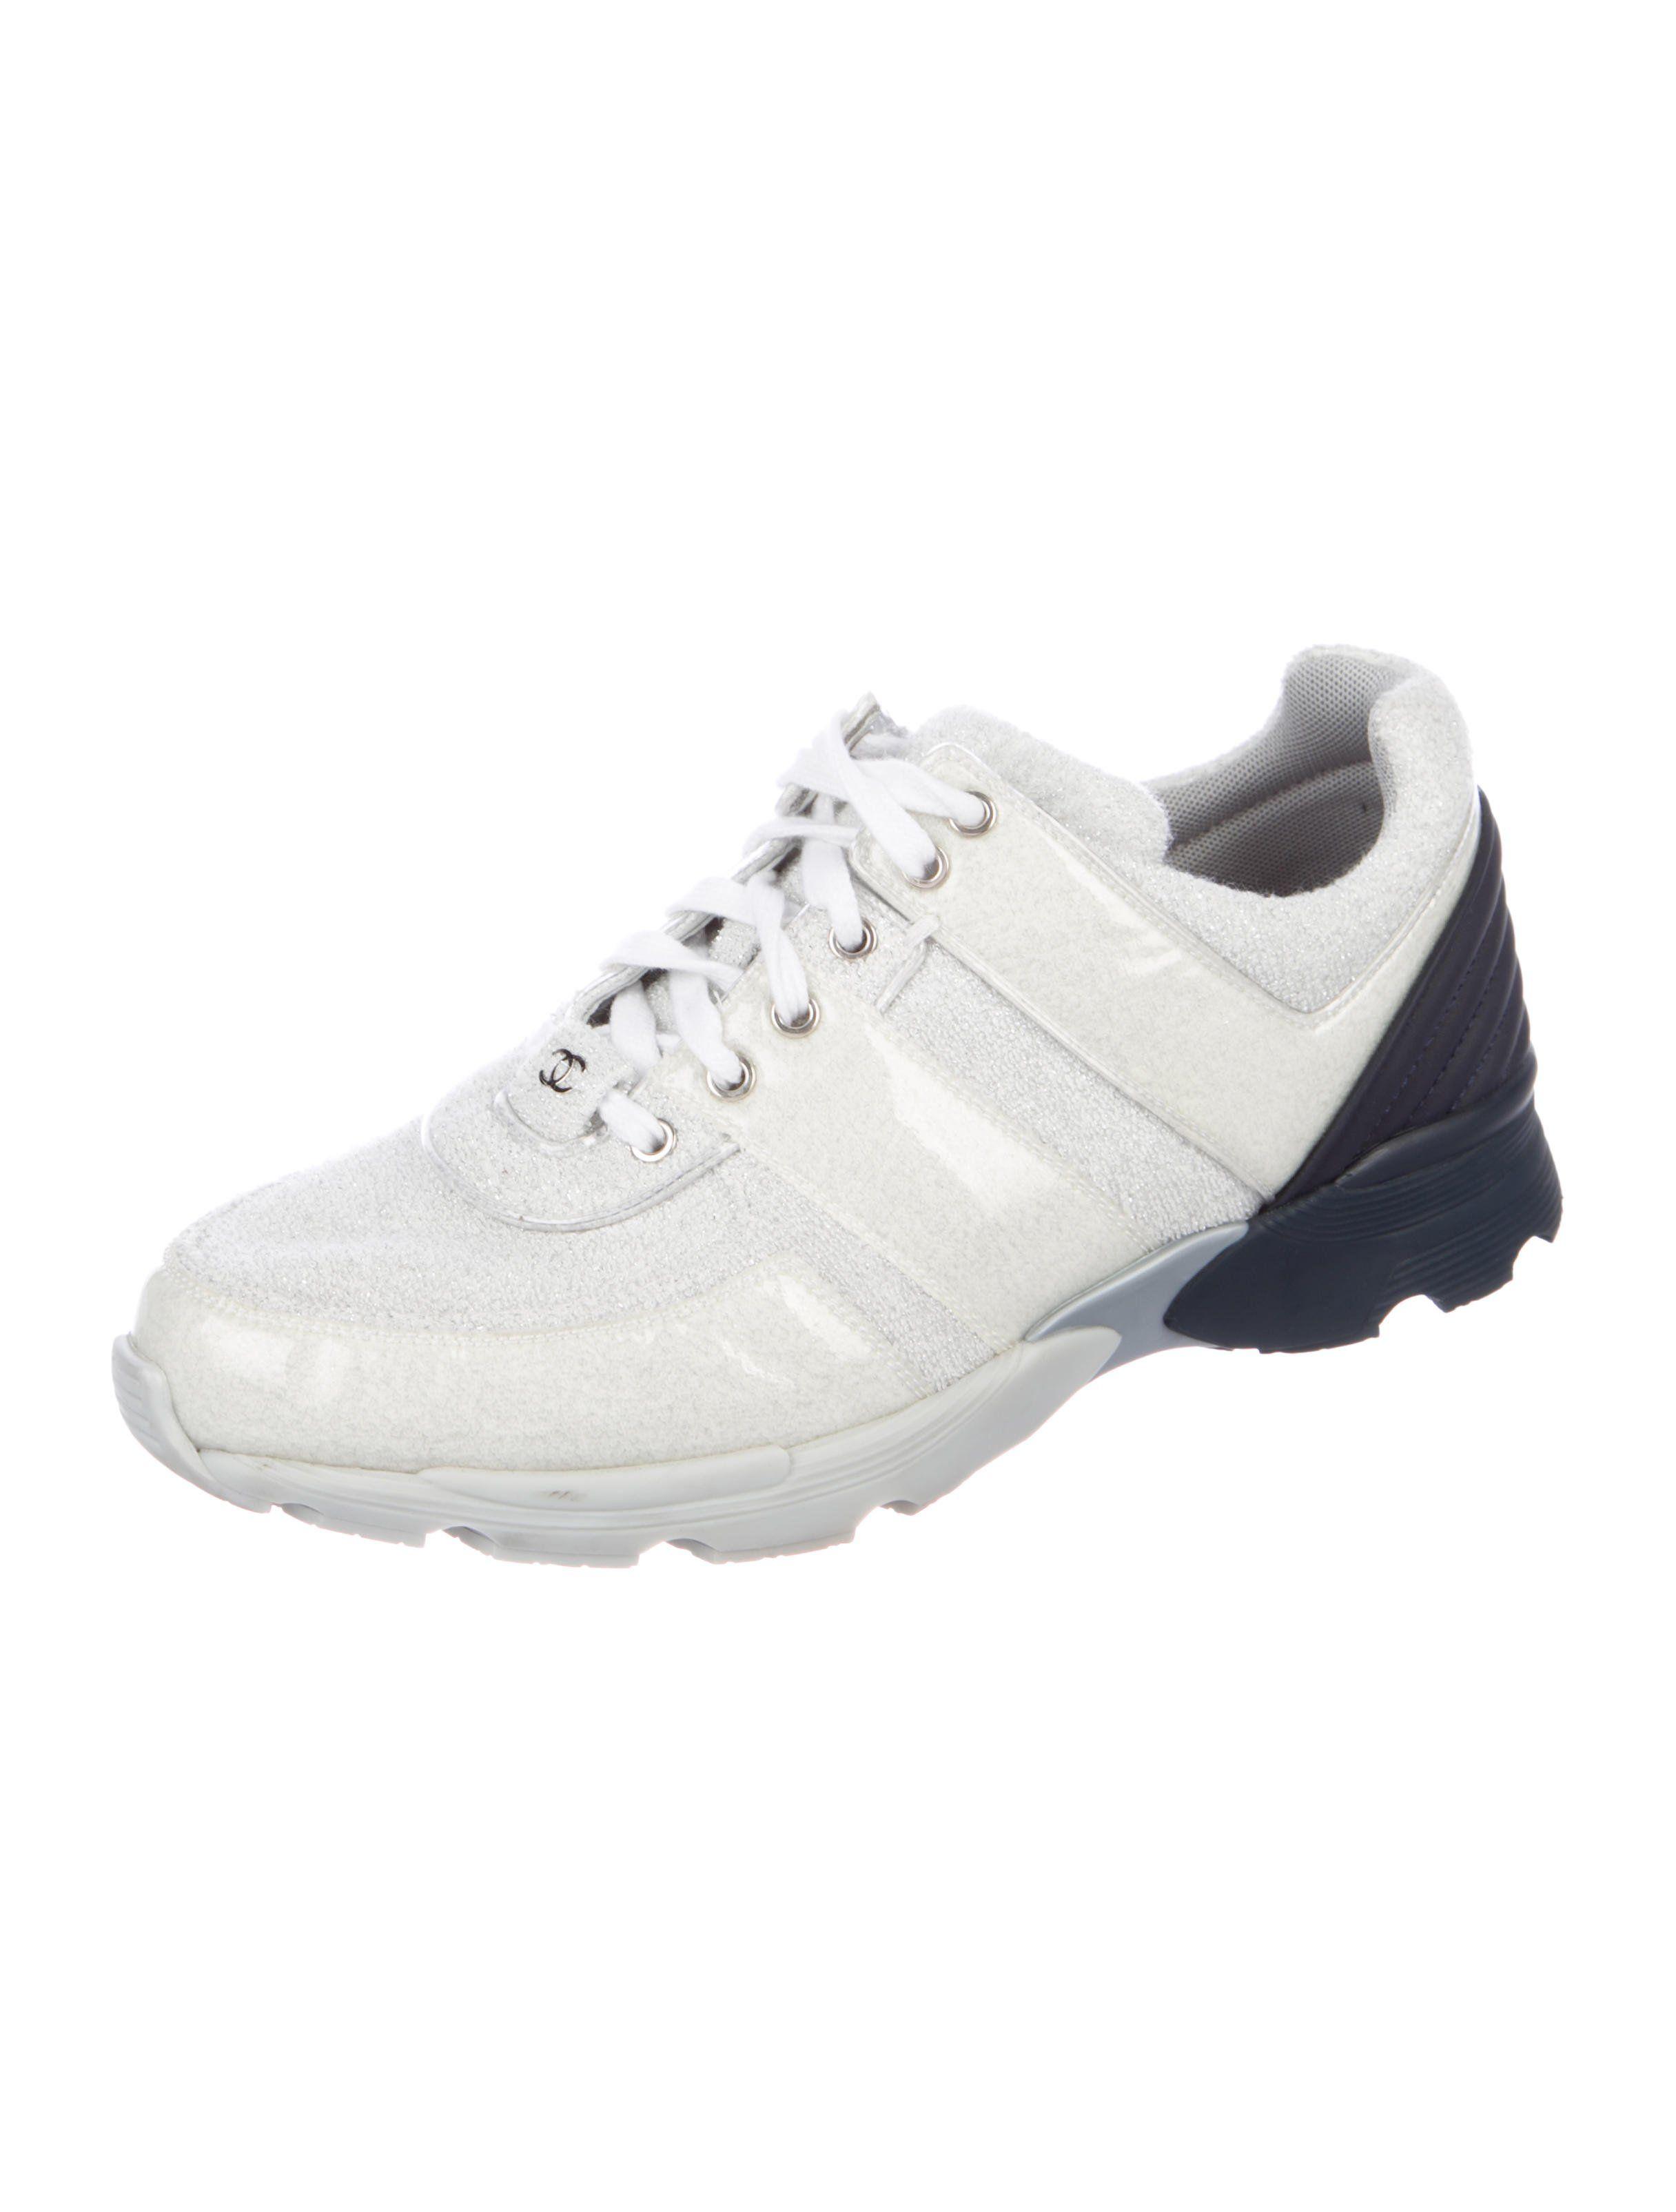 Metallic-Accented PVC-Trimmed Sneakers   Leggings Tattoos   Sneakers